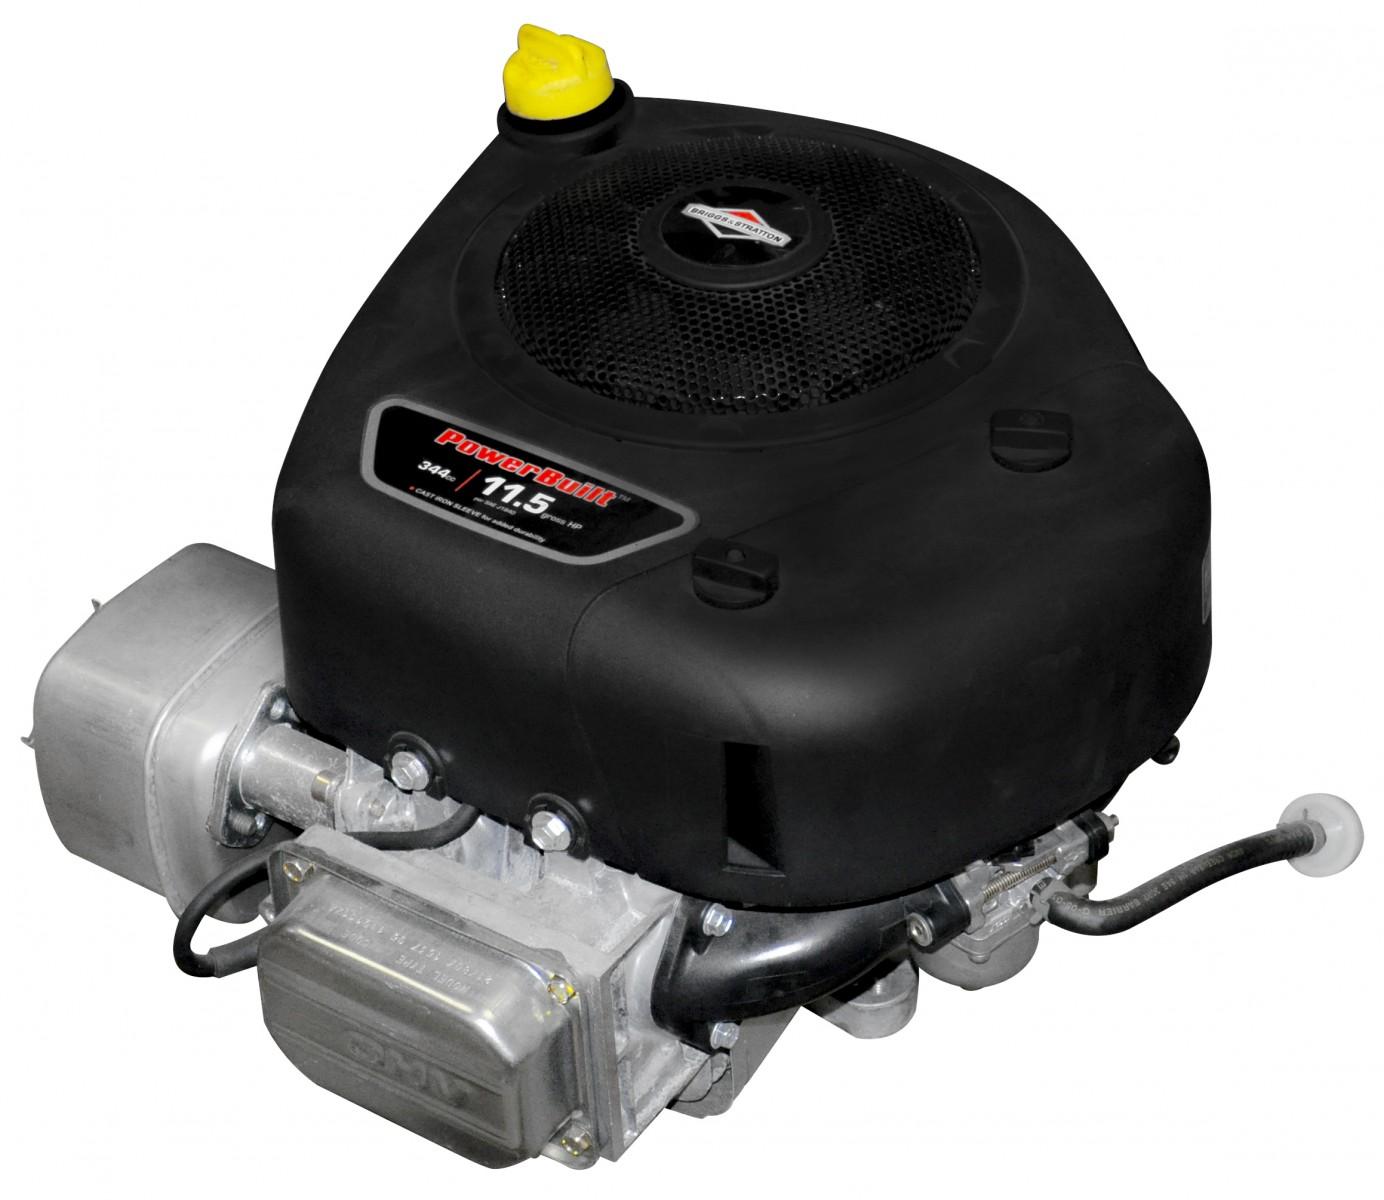 Motor BRIGGS&STRATTON 11.5 POWERBUILT OHV